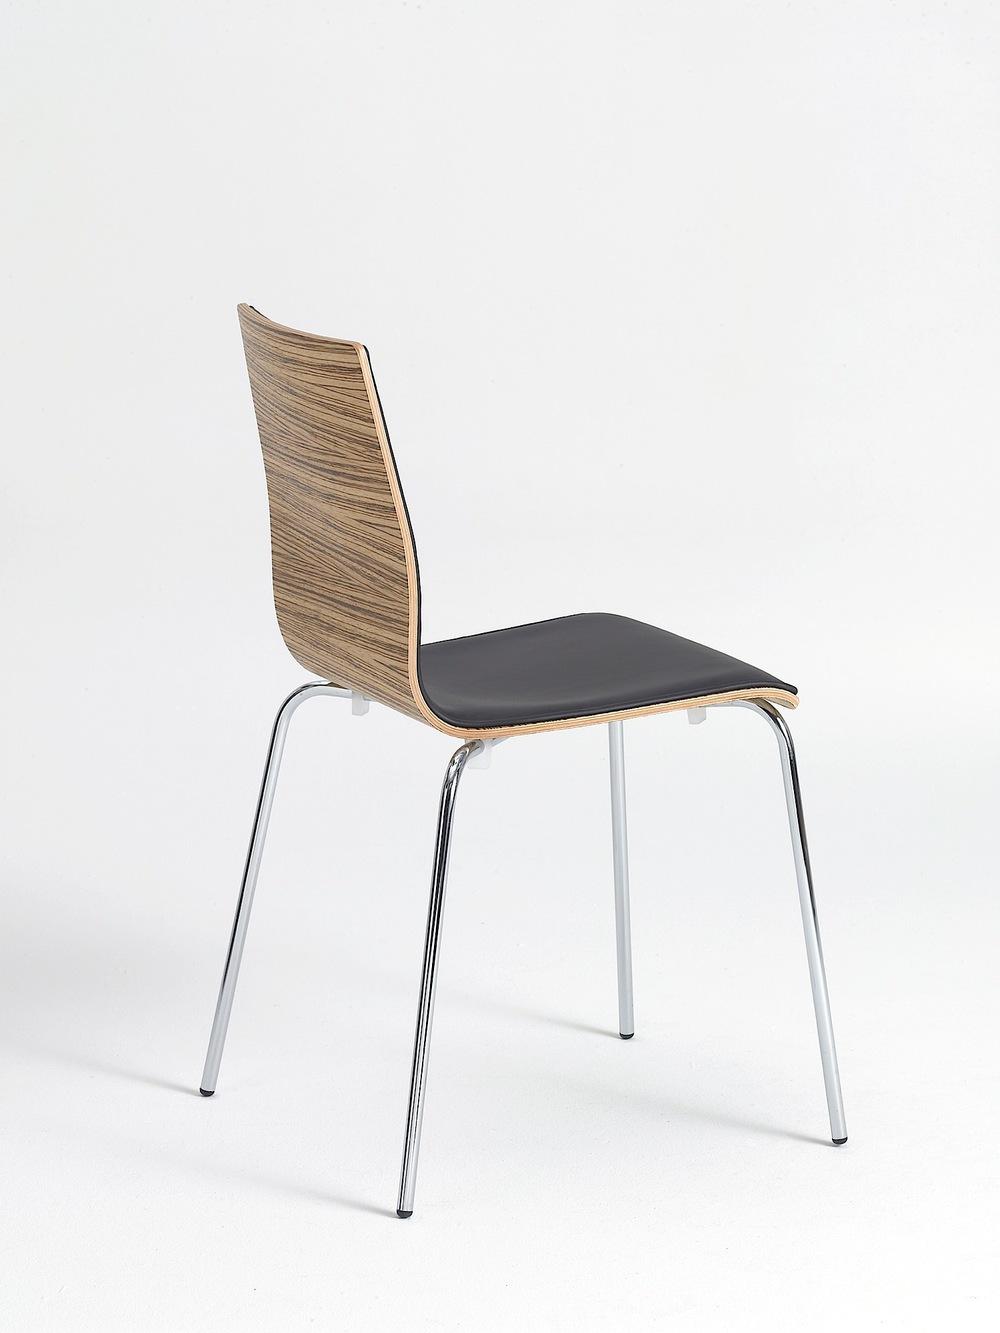 Anni_zebrano_upholster_seat_2.jpg